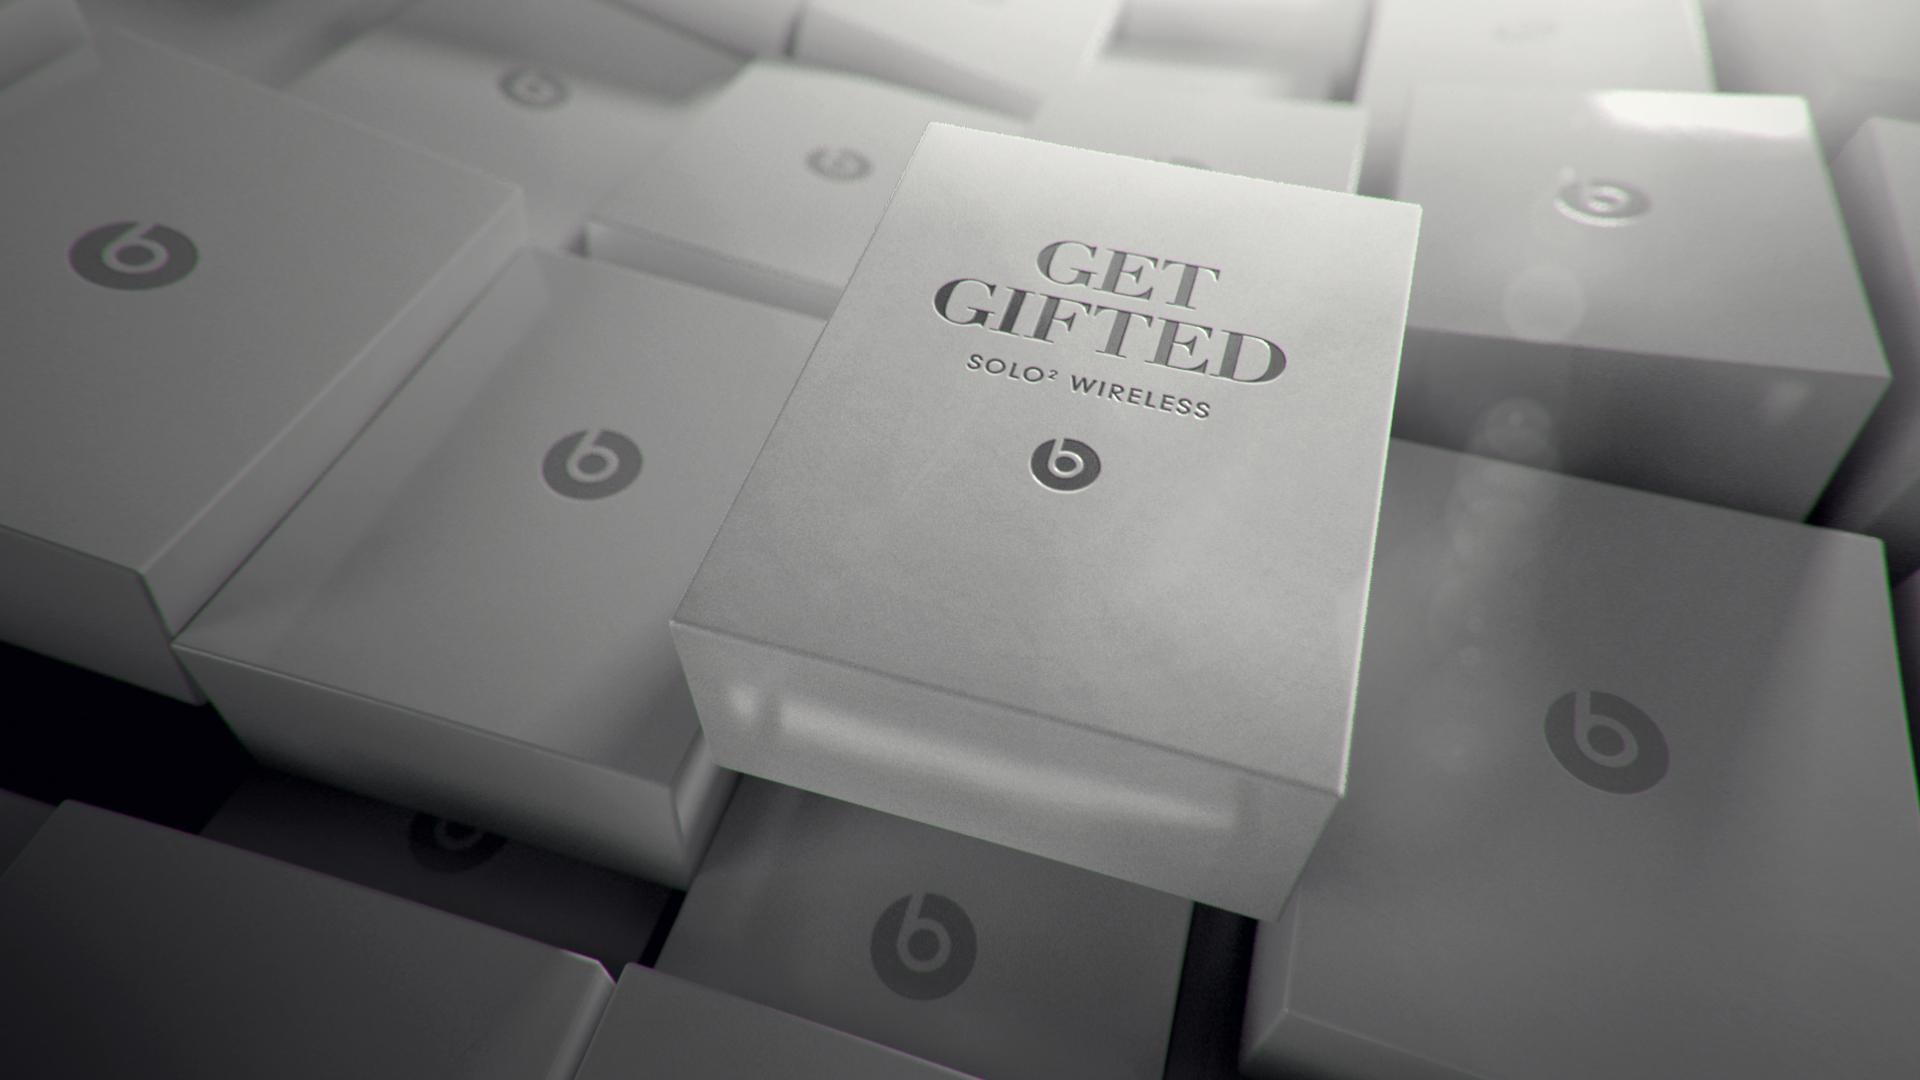 Michael_Tavarez_Beats_Get_Gifted_01.jpg